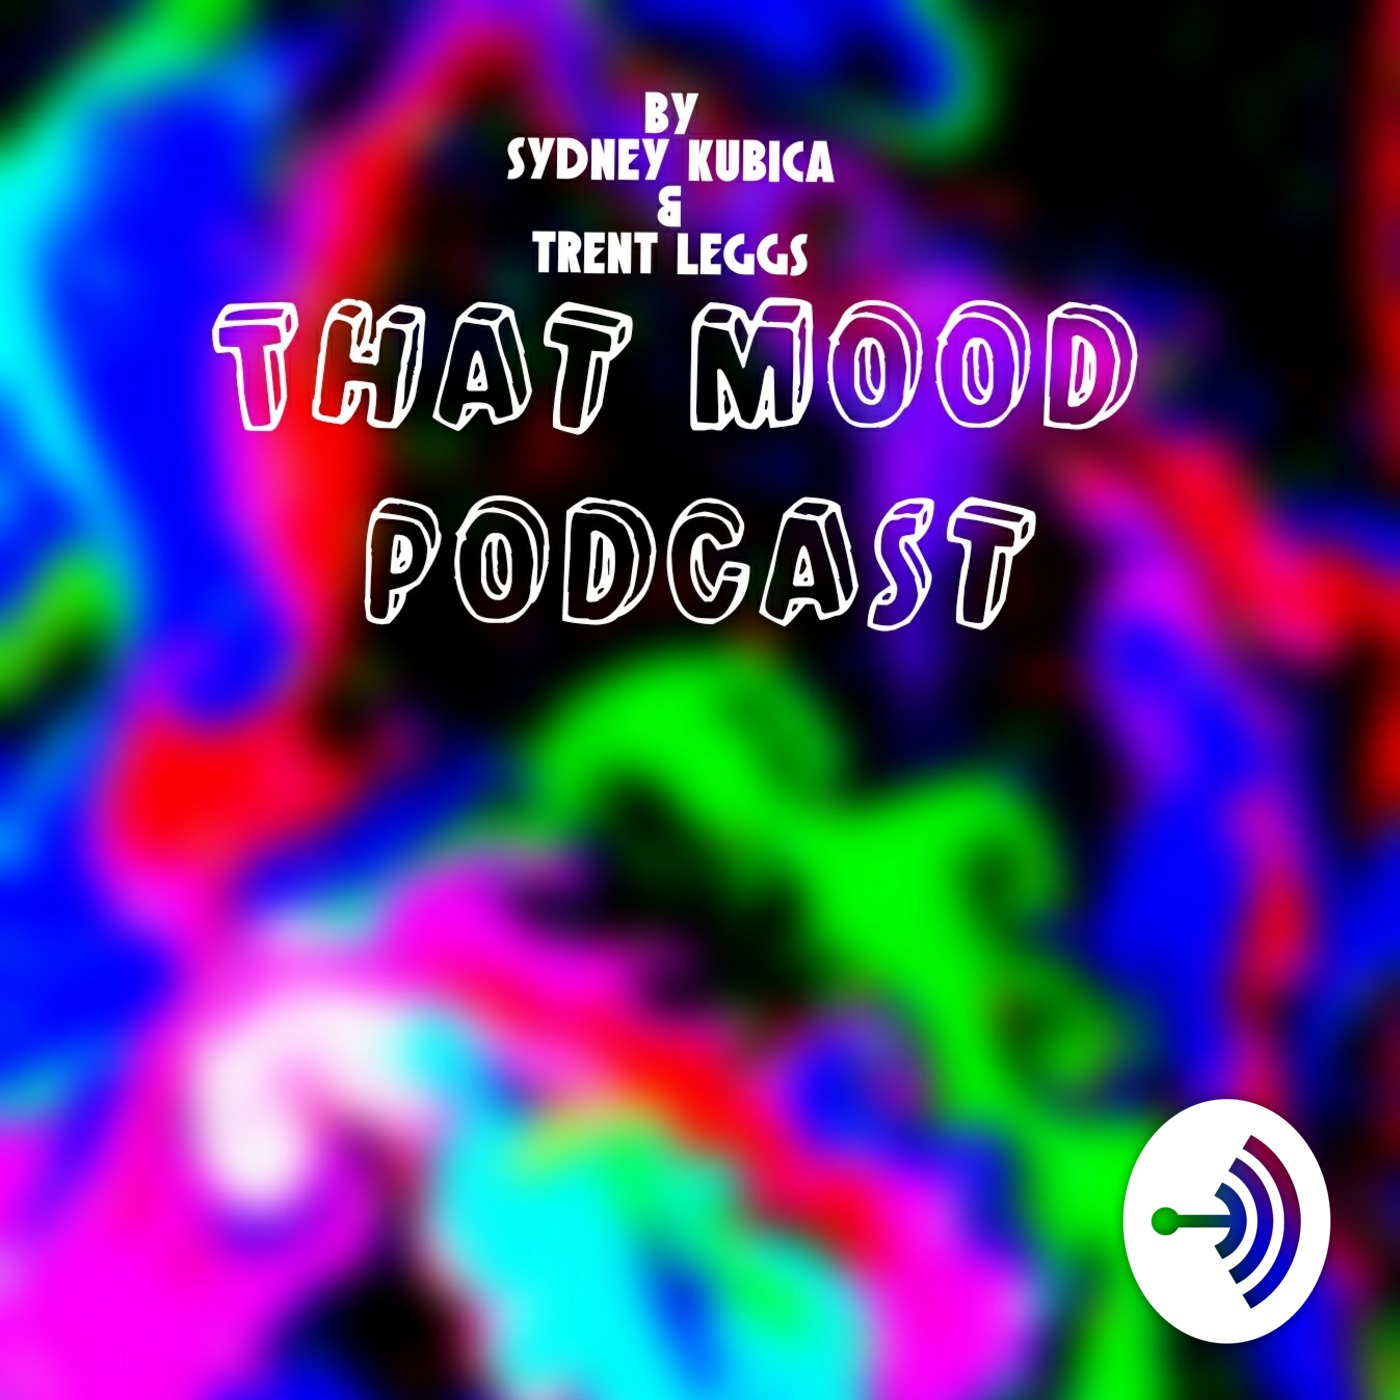 That Mood Podcast